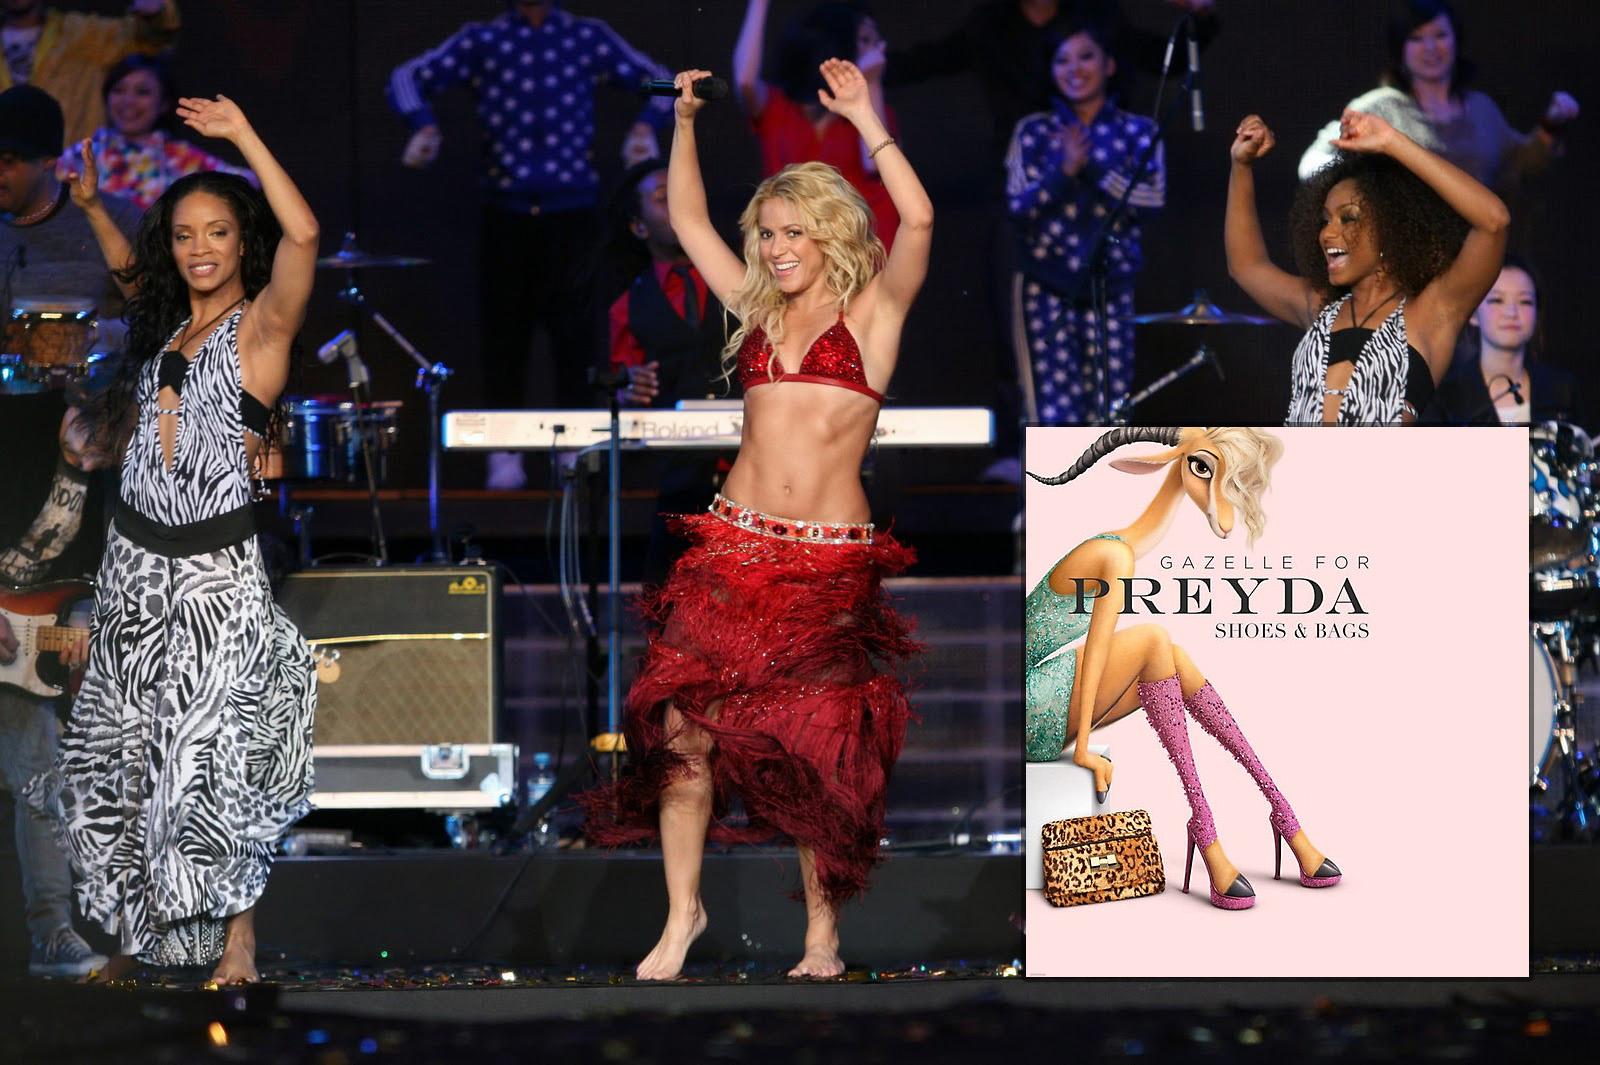 Shakira%252BHip%252Bdance%252BWallpapers%2Bkopia.jpg